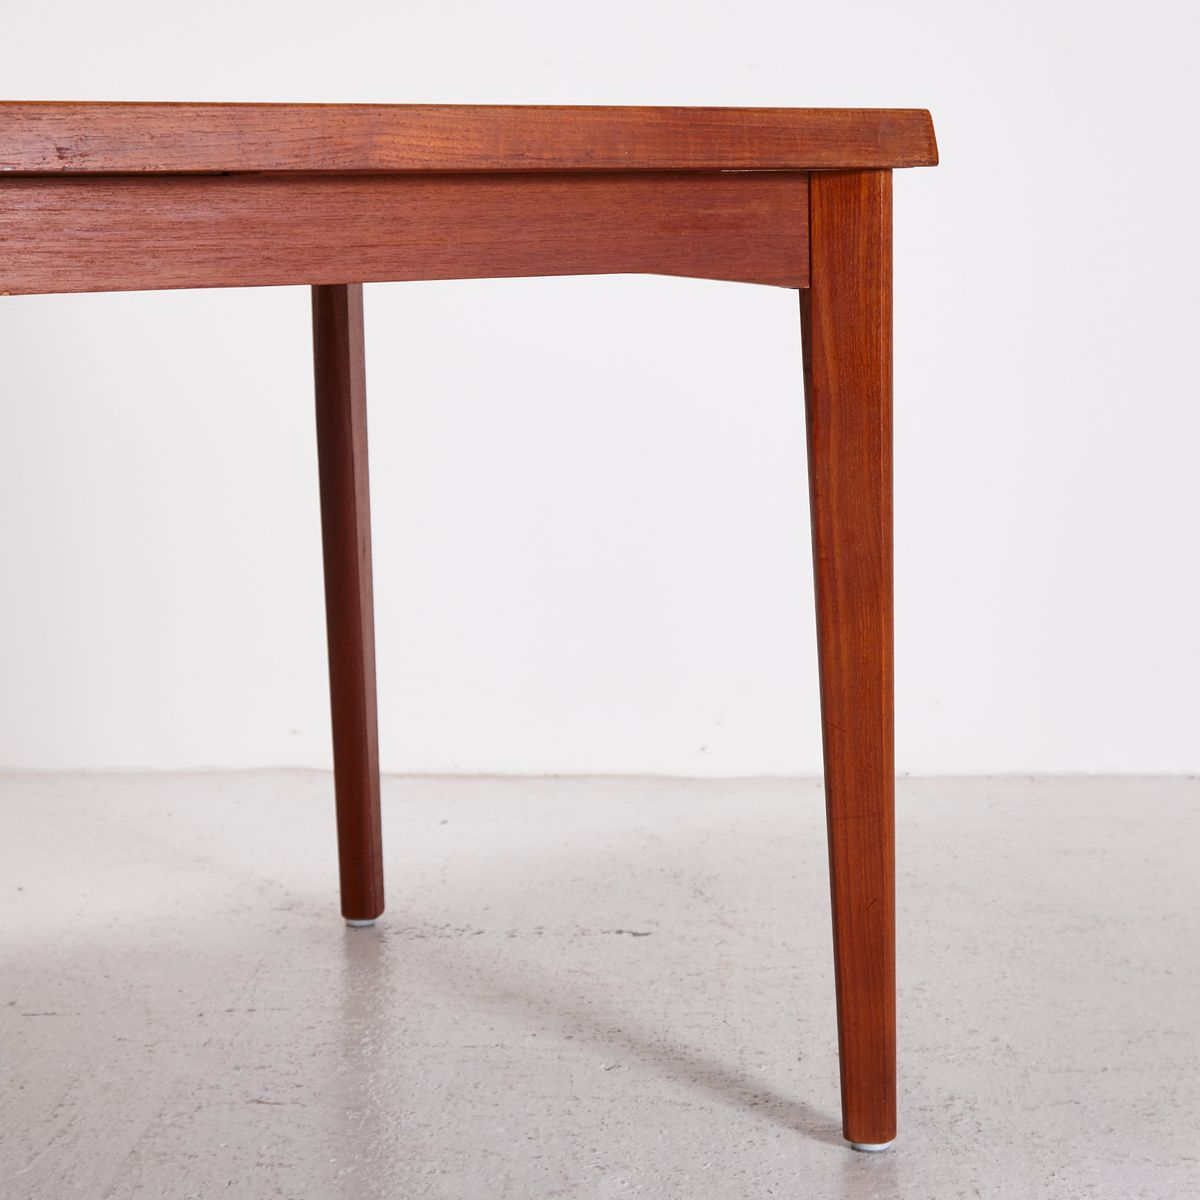 Extendable Teak Dining Table by Henning Kj230rnulf for Vejle  : extendable teak dining table by henning kjaernulf for vejle mobelfabrik 1960s 6 from www.pamono.com size 1200 x 1200 jpeg 73kB